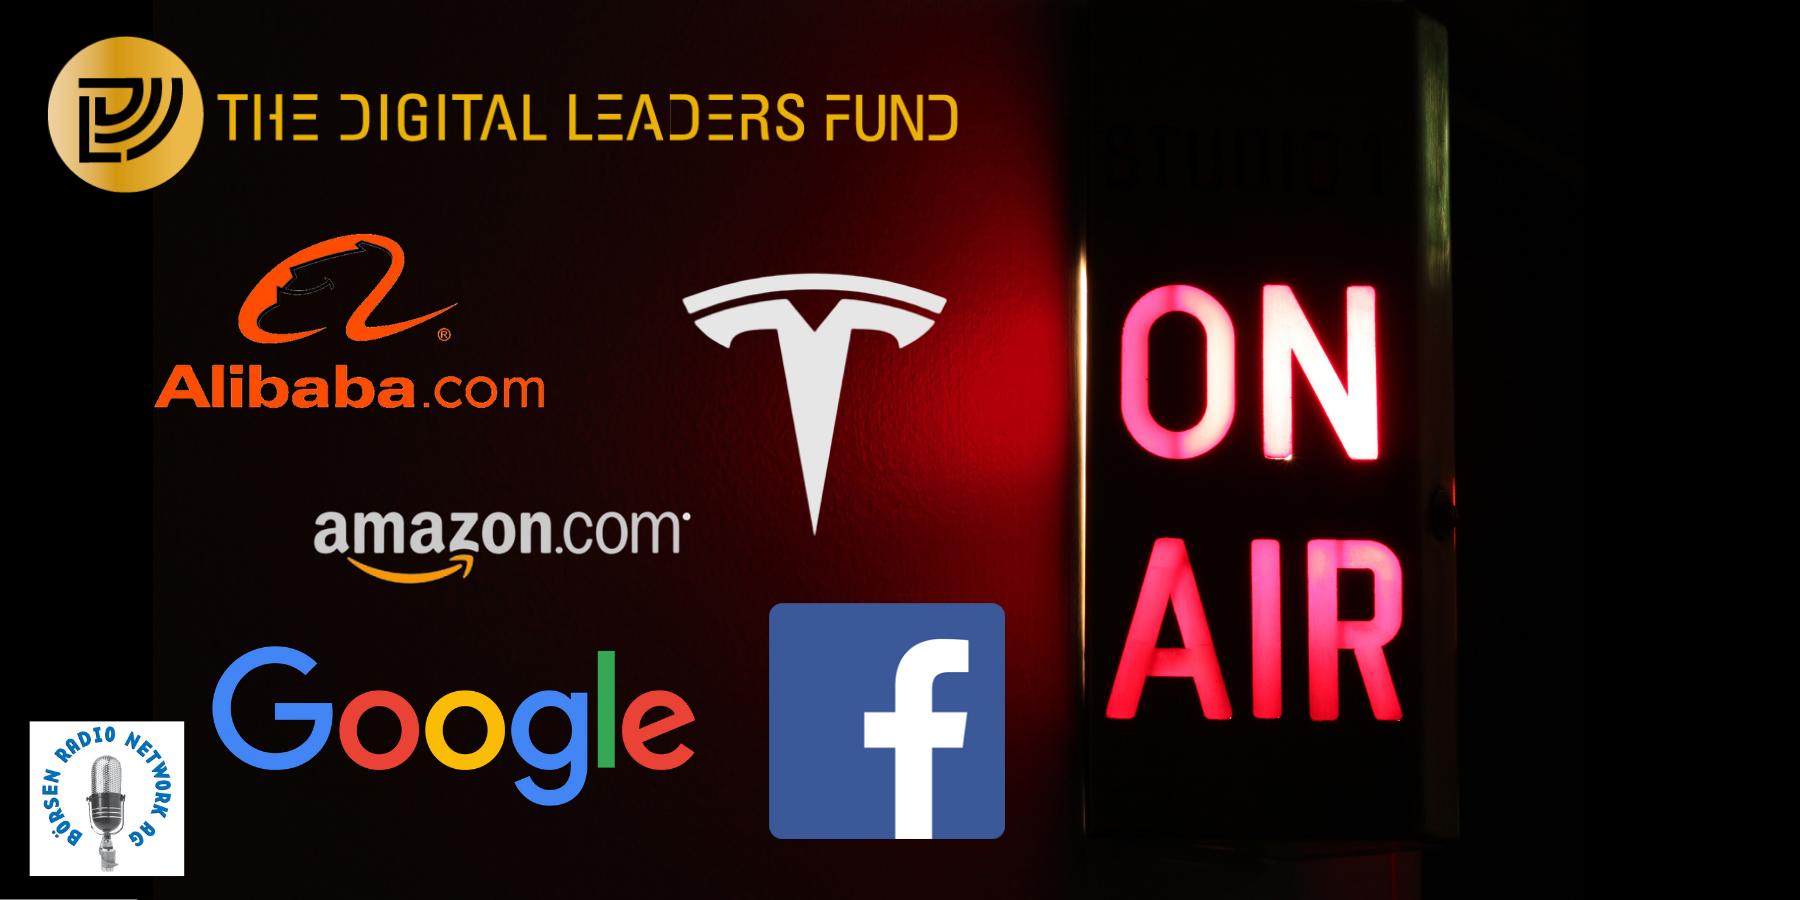 börsenradio interview digital leaders fund